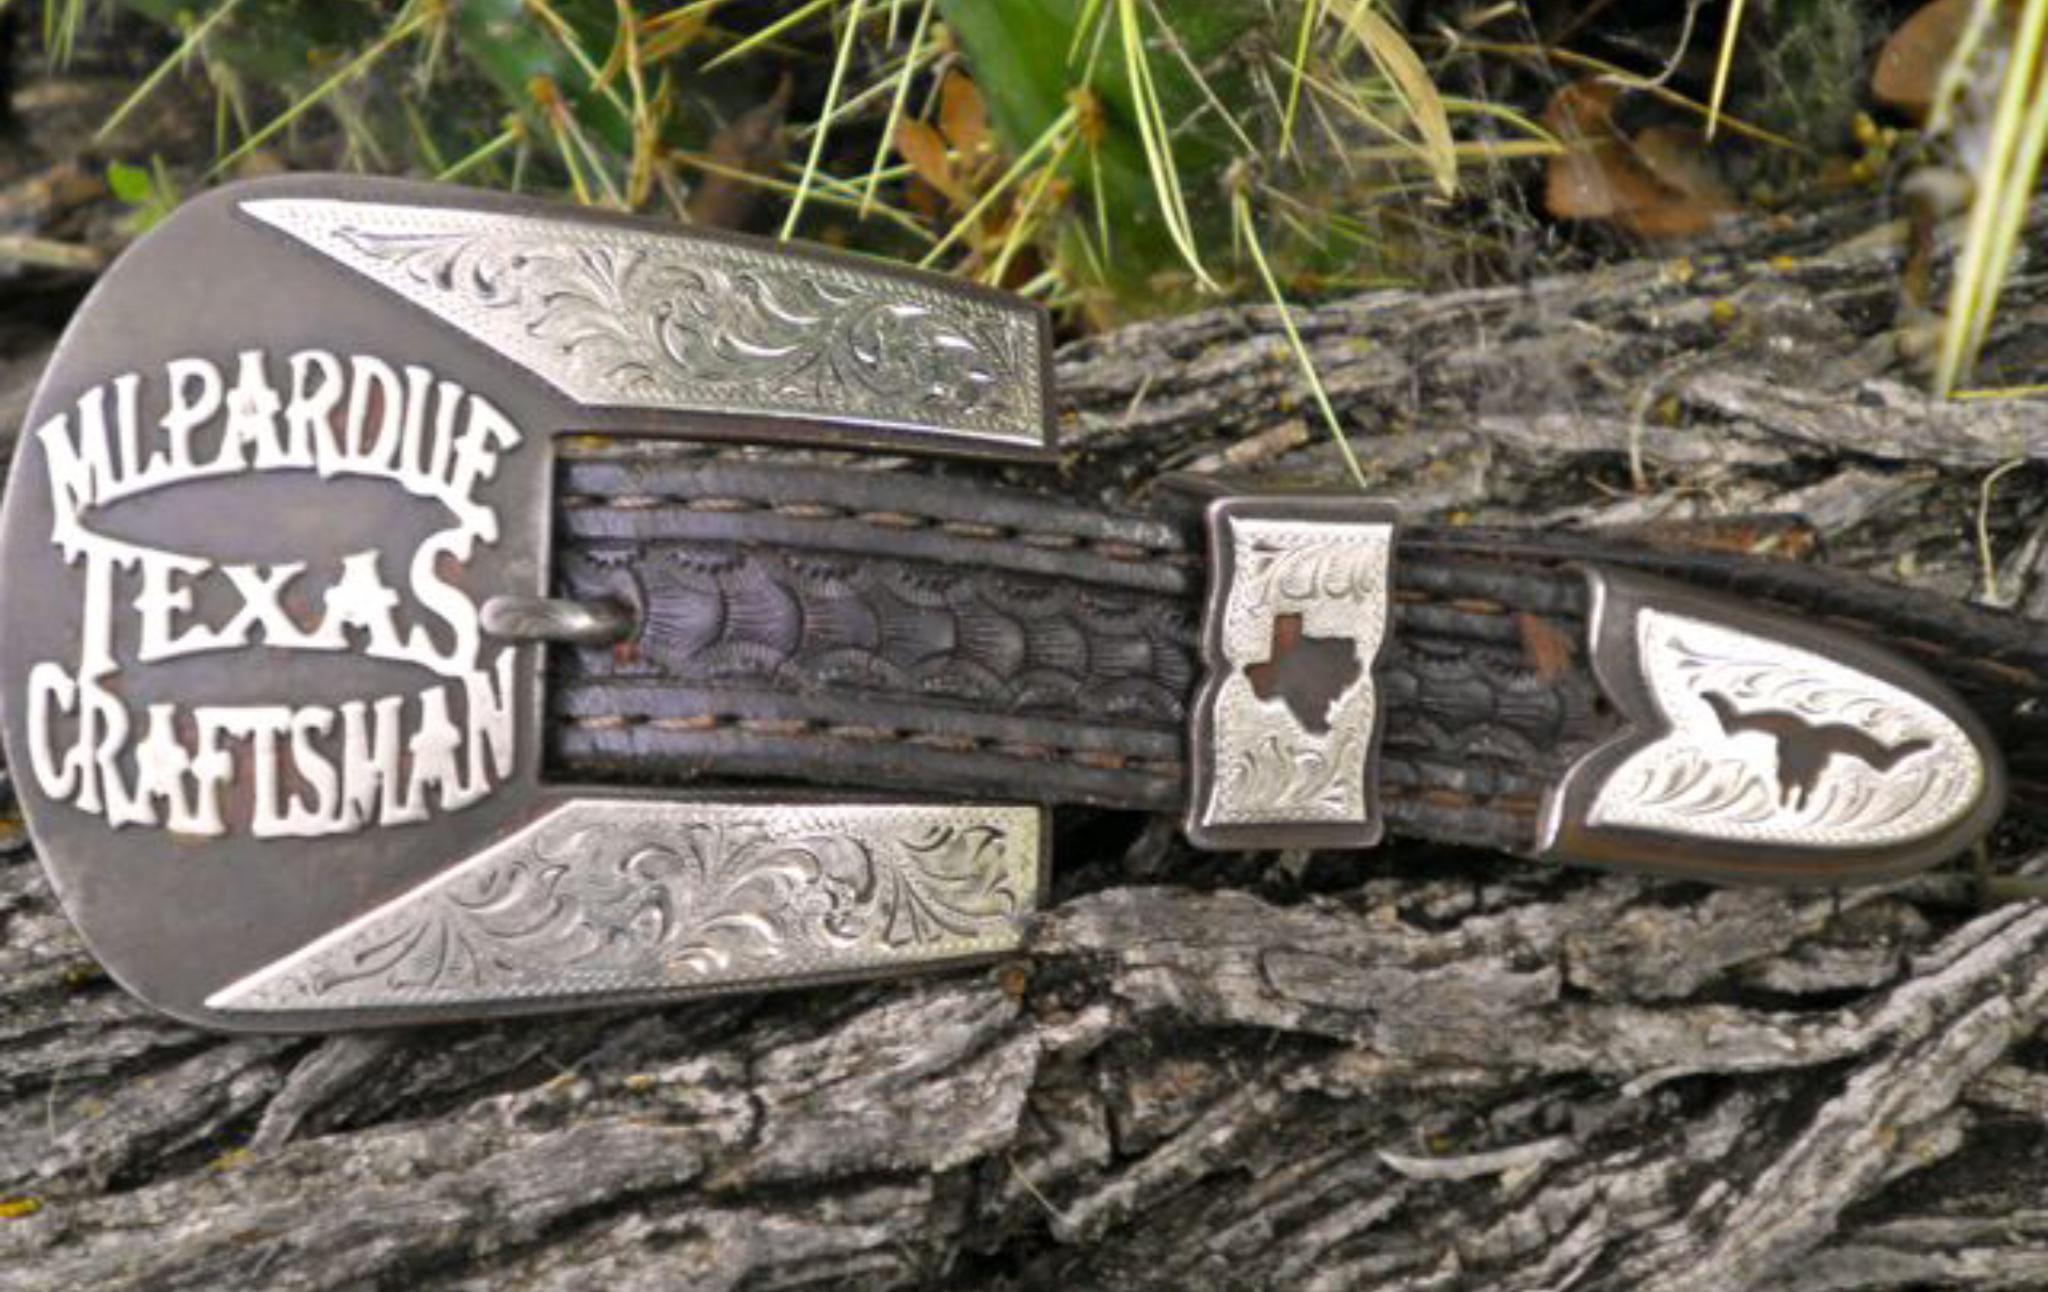 TX craftsmanship buckle